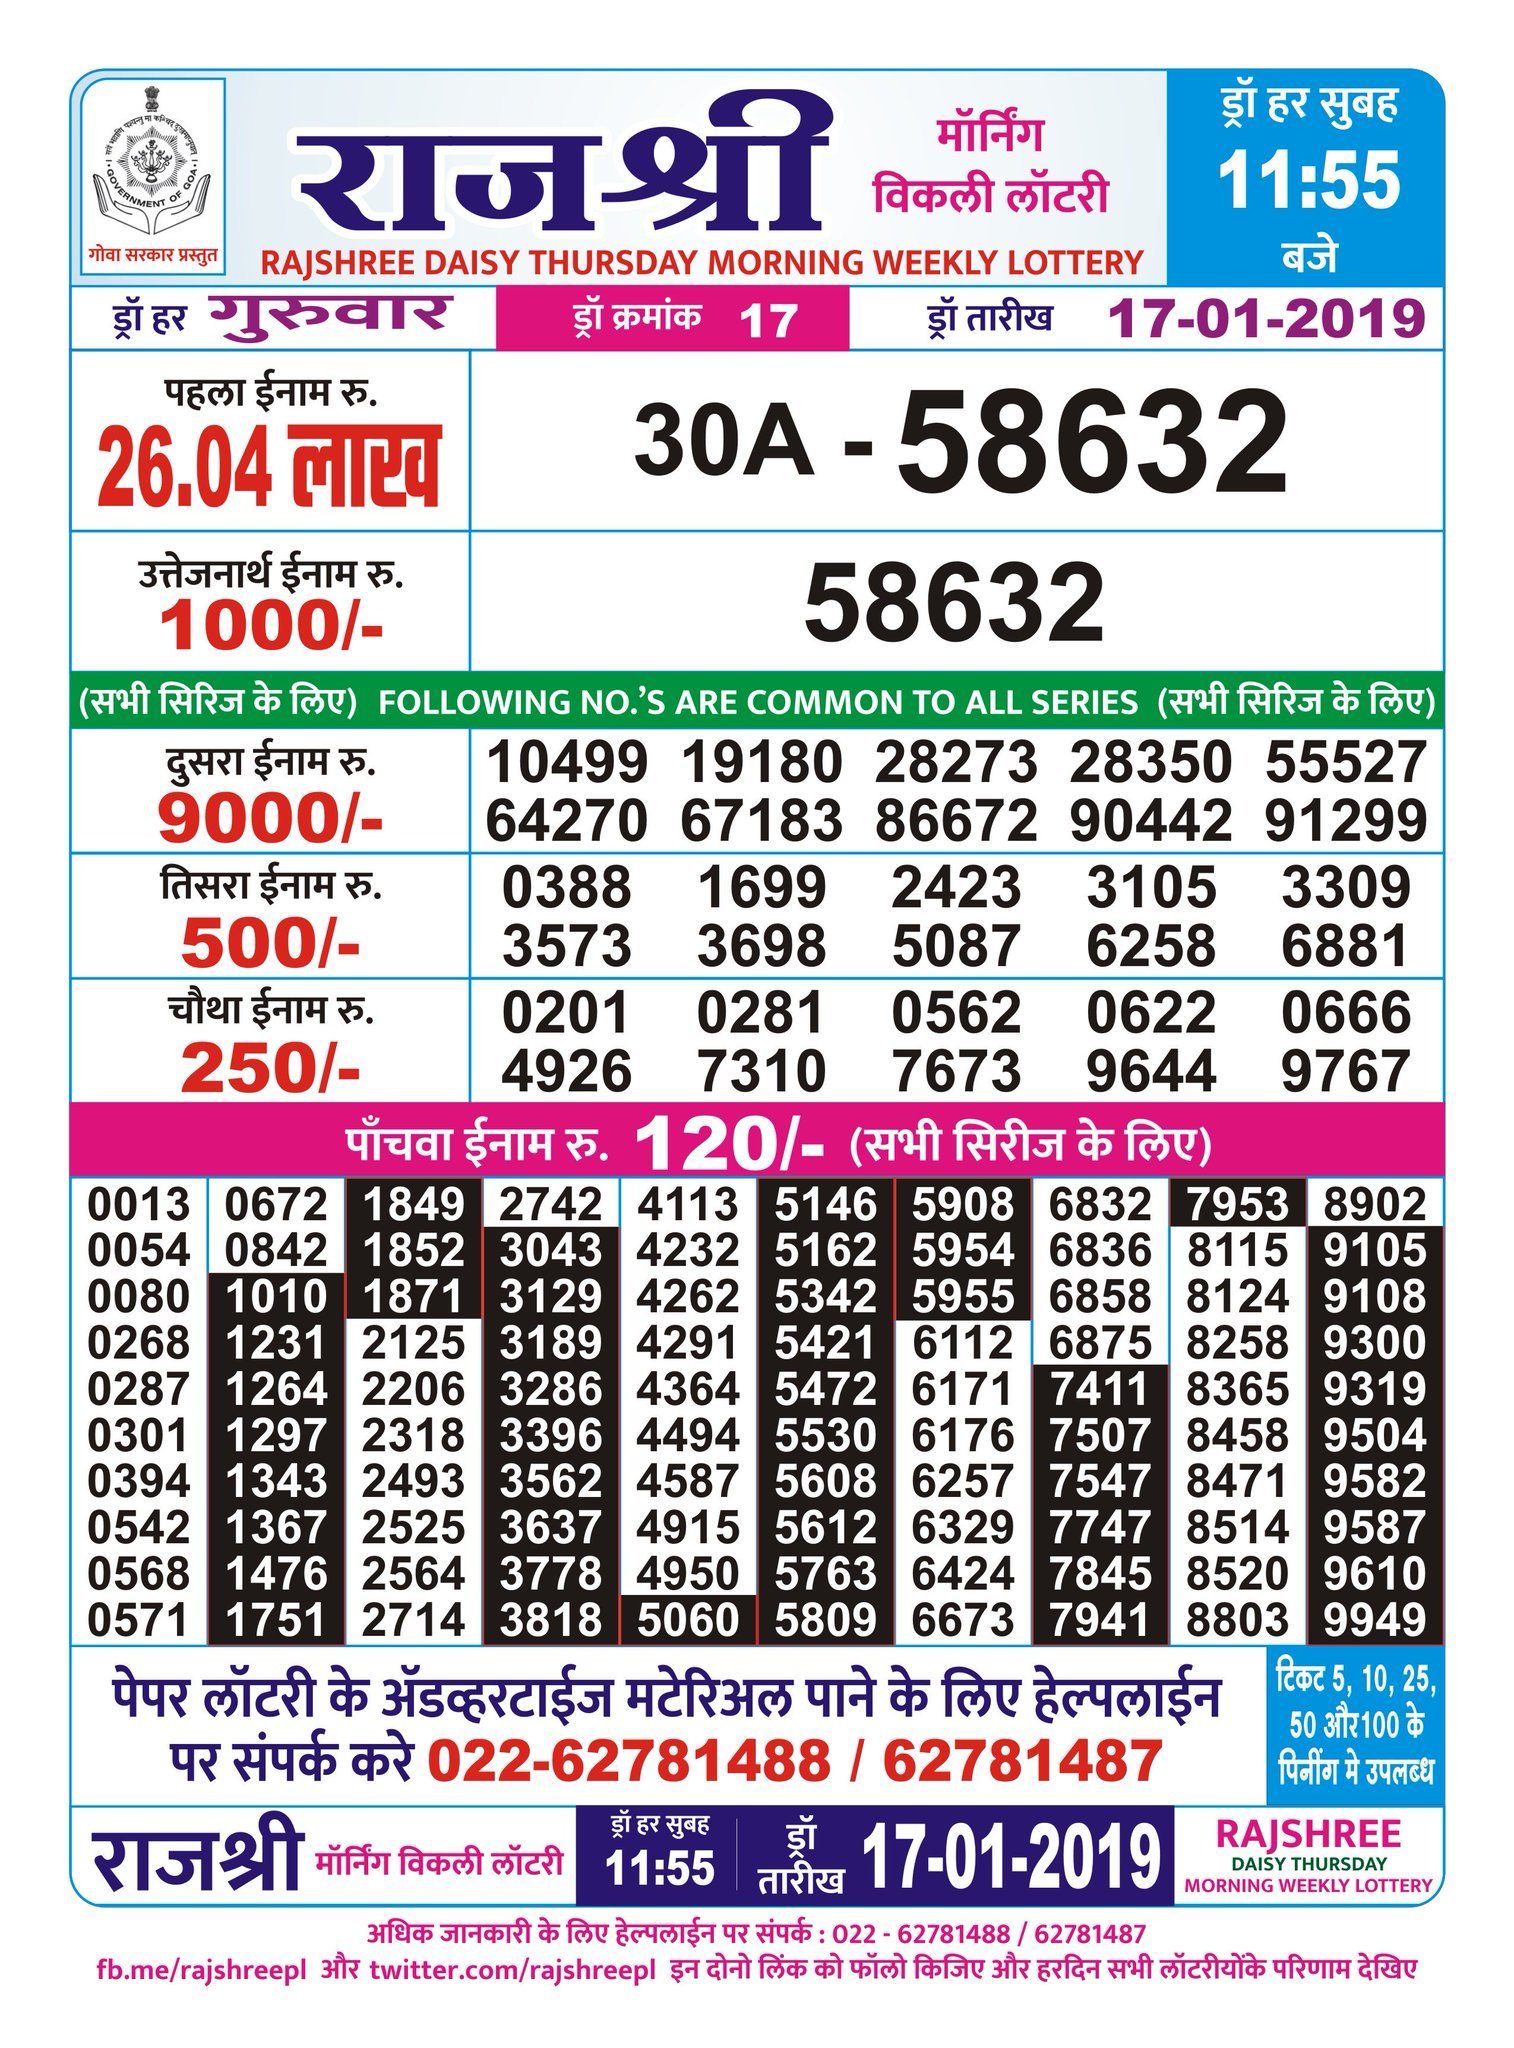 Real Estate Photos ⁓ Top Twelve Goa State Lottery Rajshree Daisy